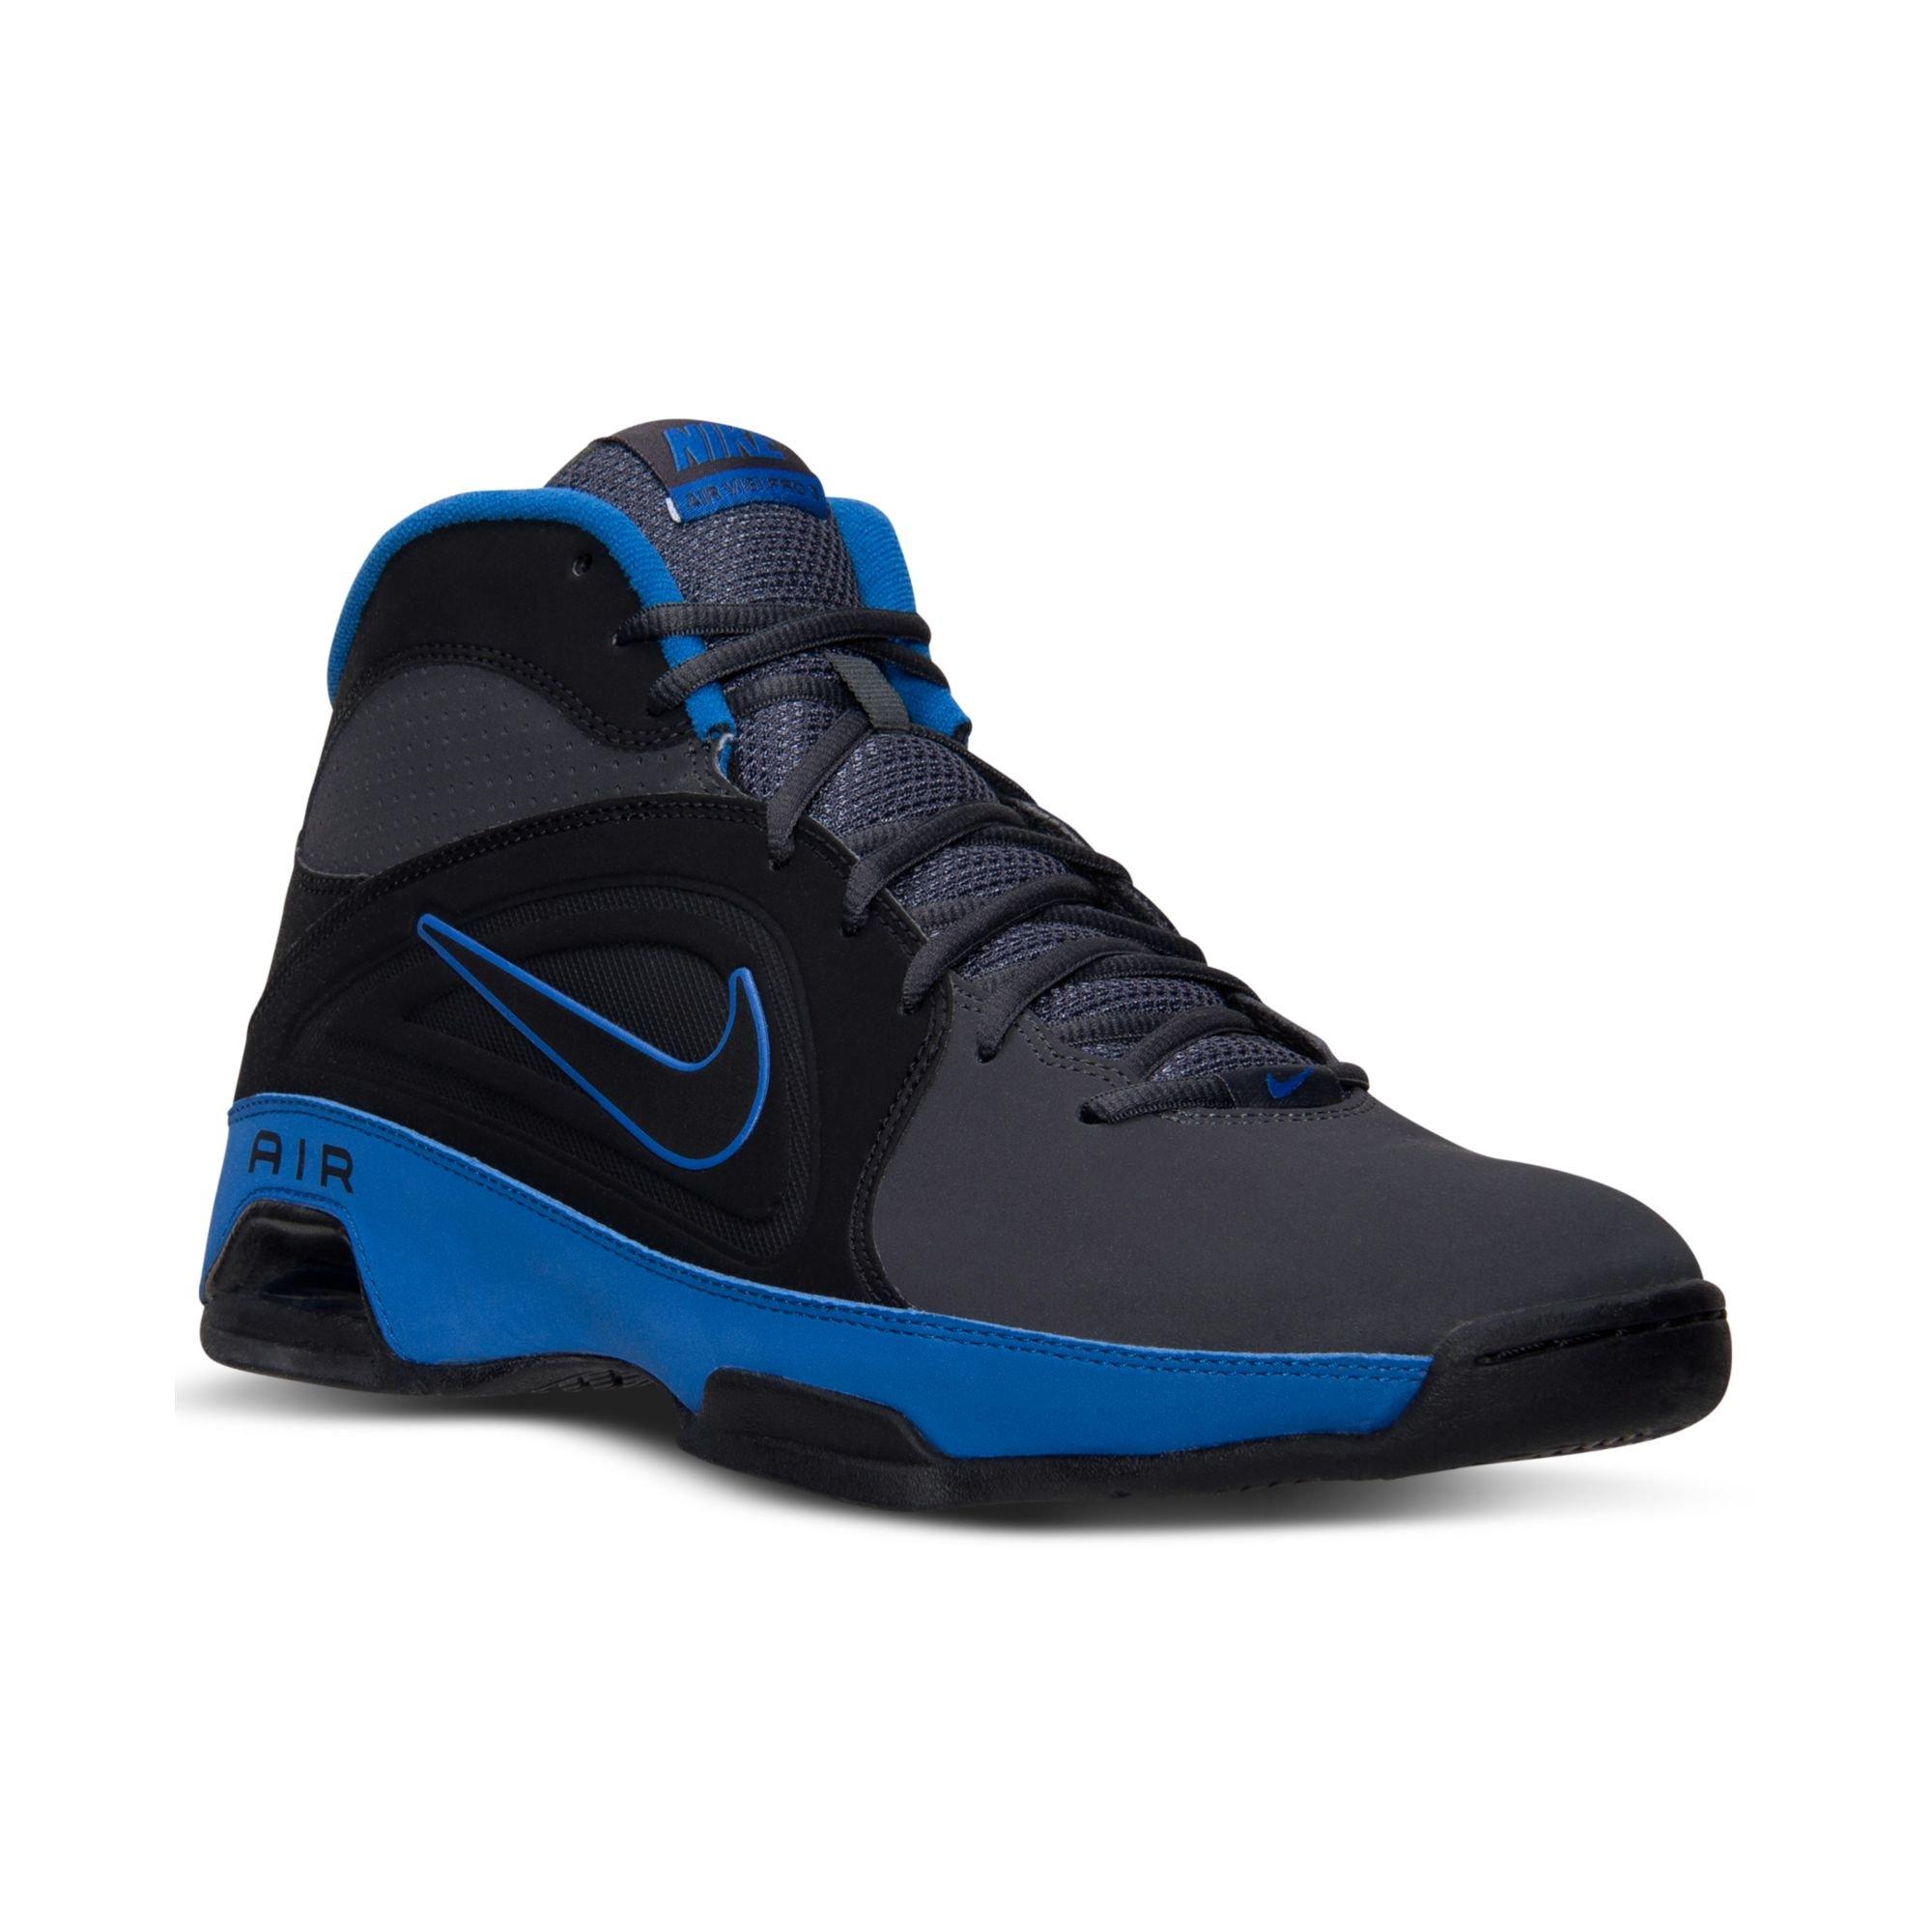 Nike air max stutter step